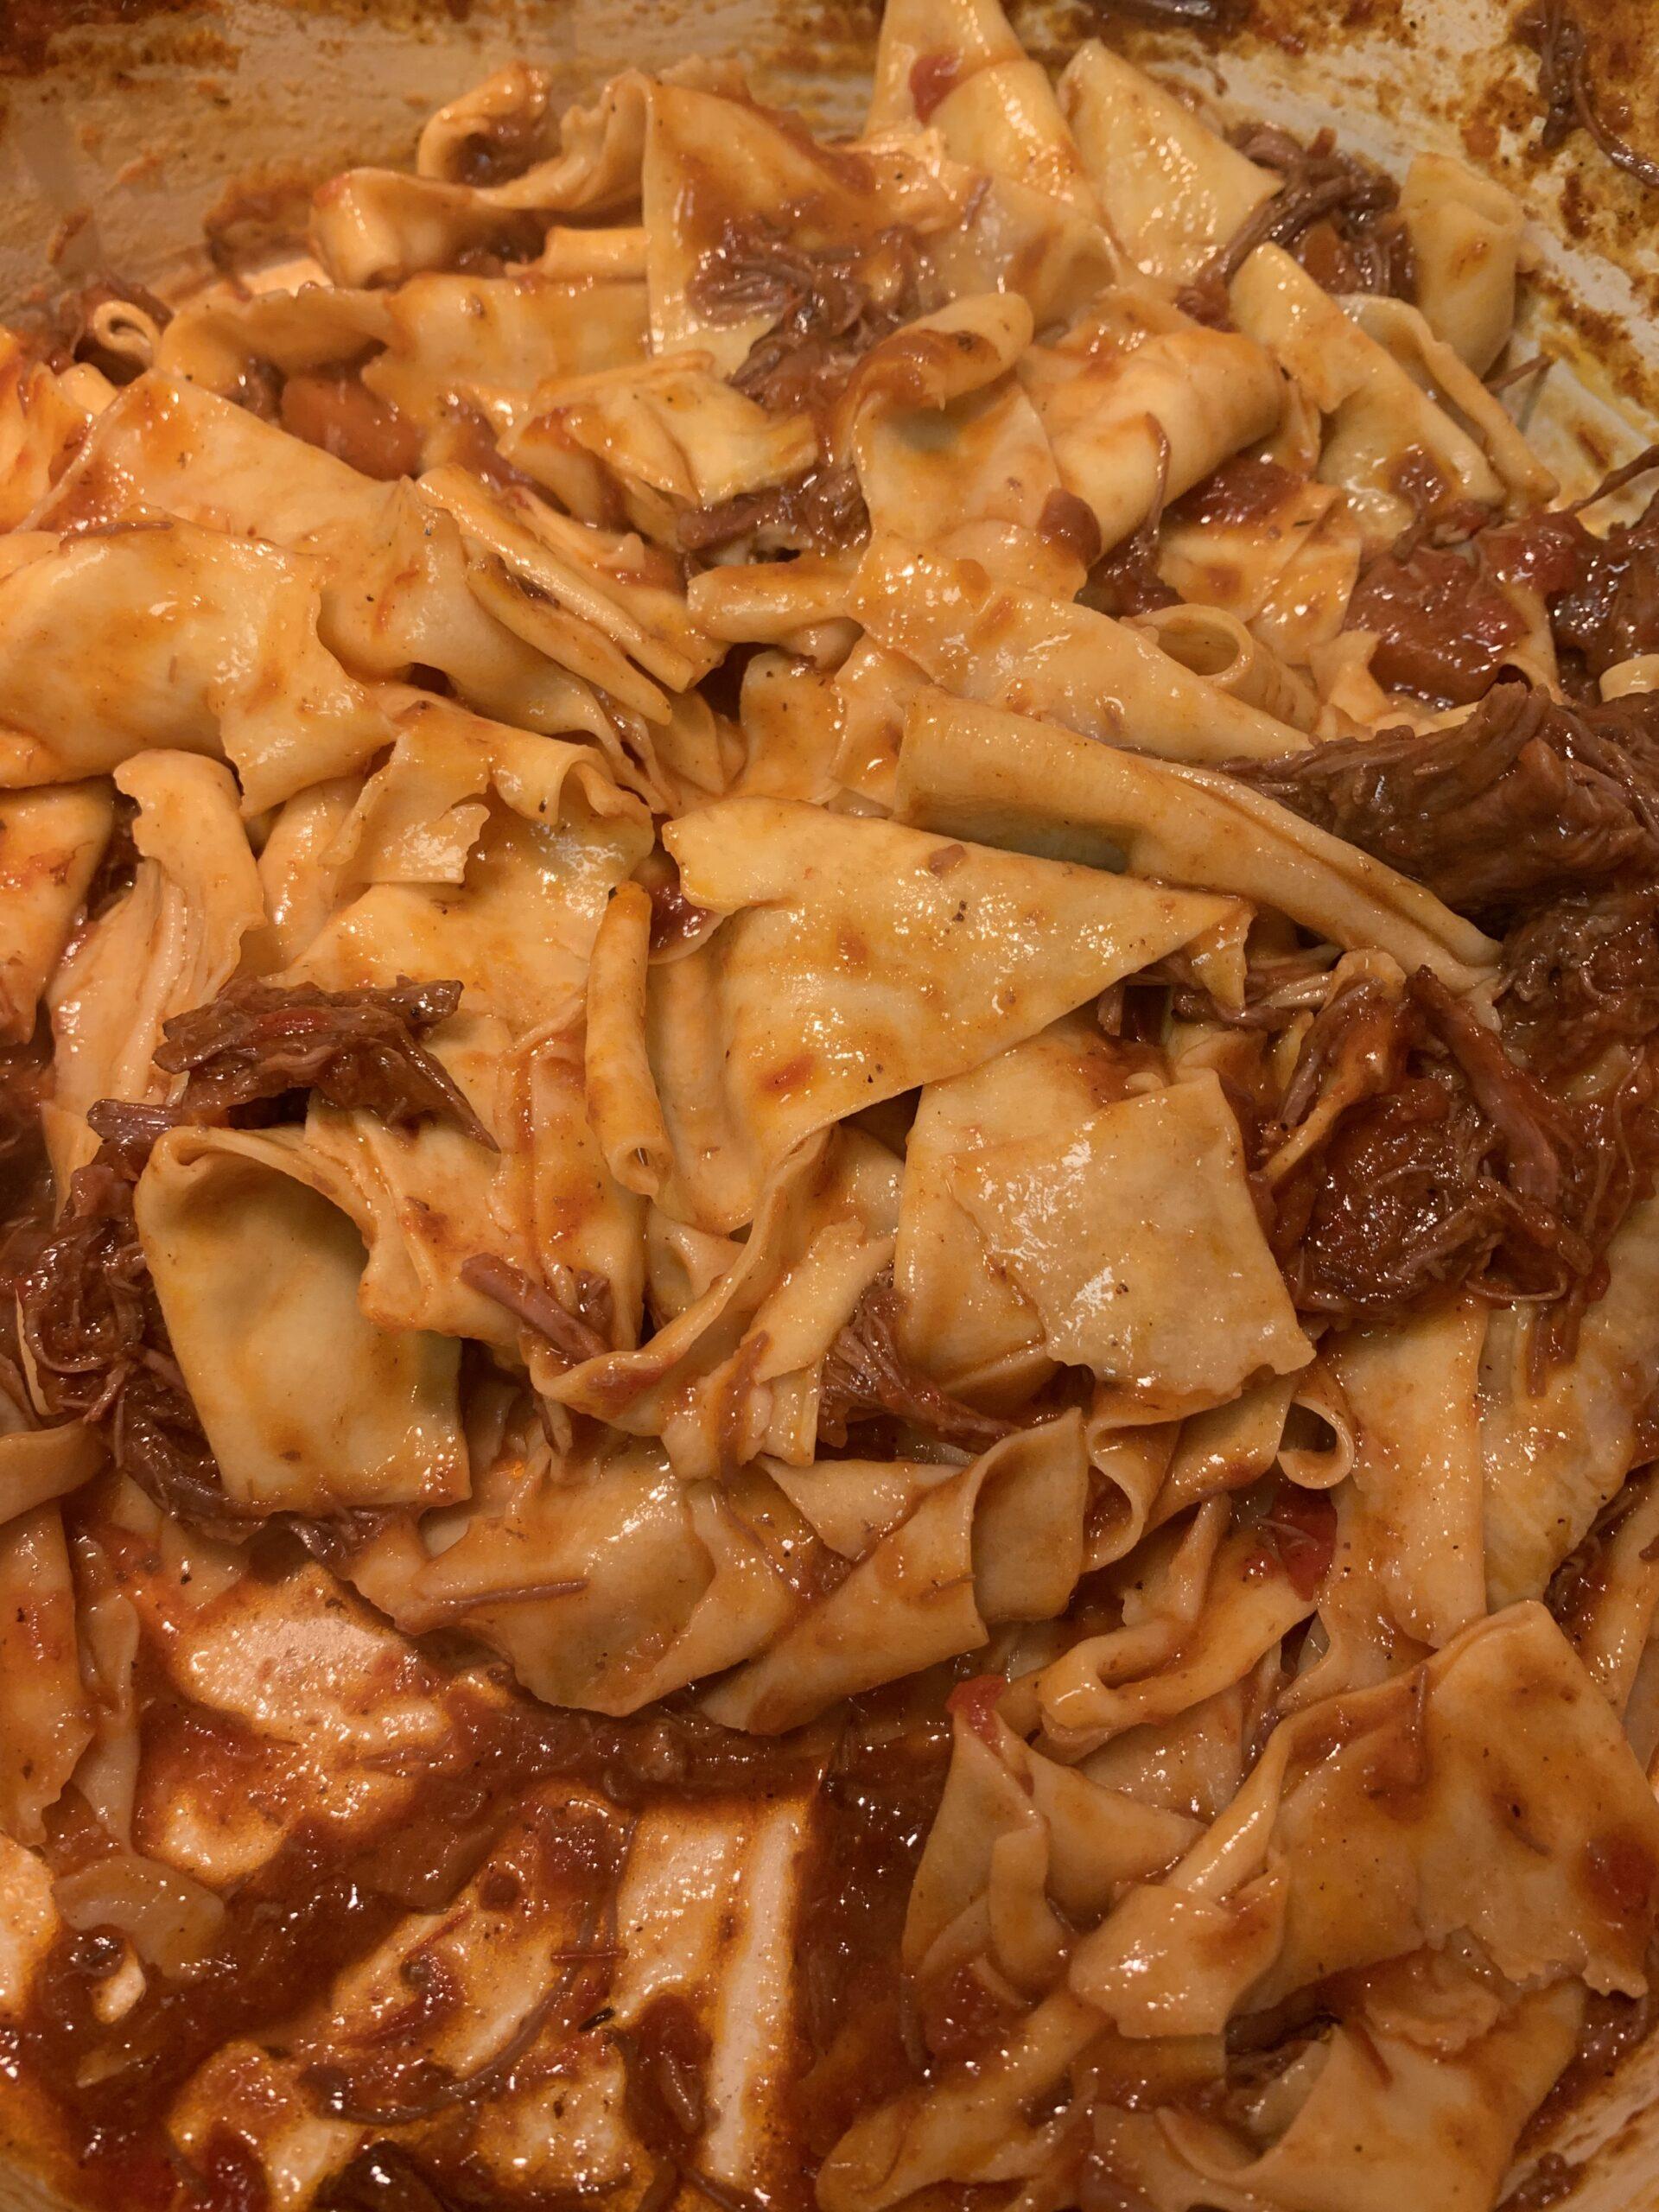 Papardelle pasta noodles mixed with short rib ragu sauce